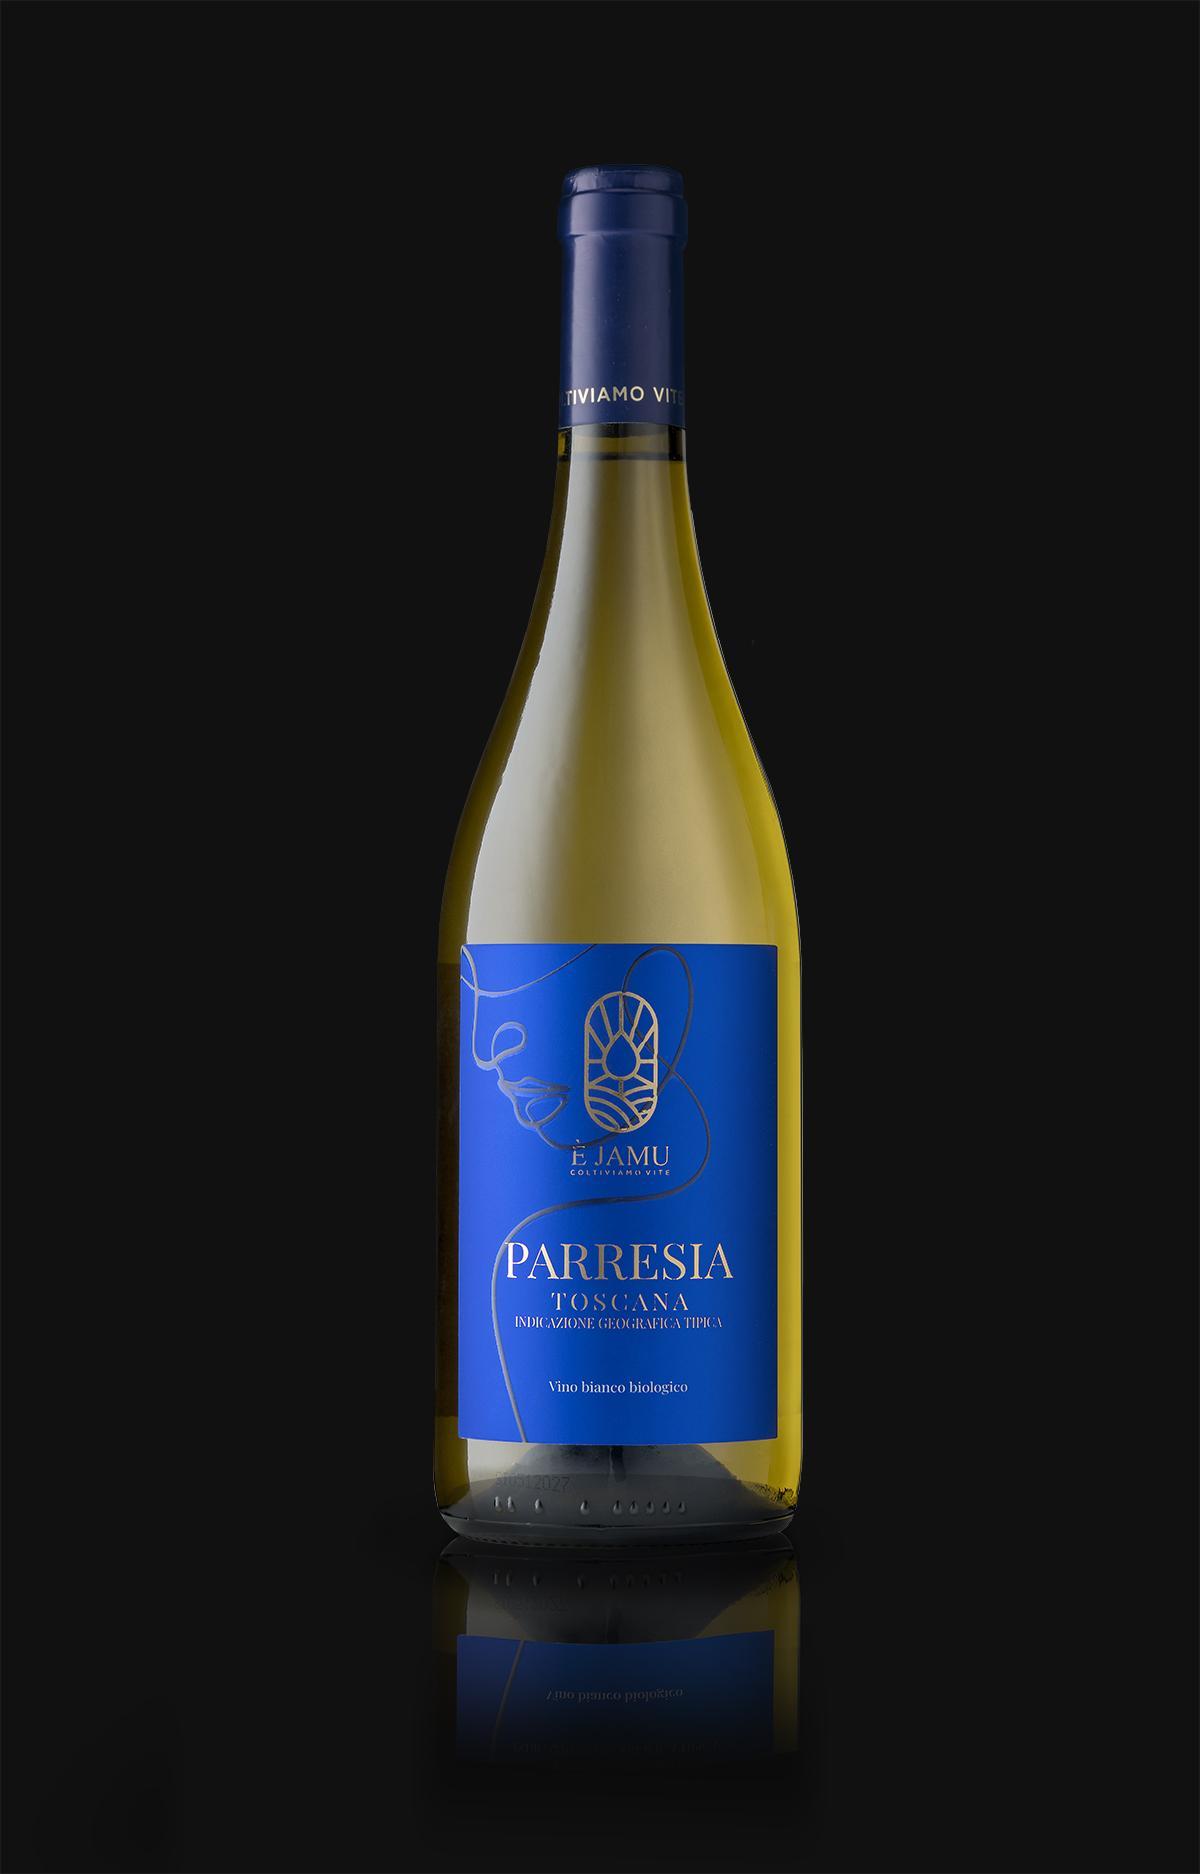 parresia white wine ejamu